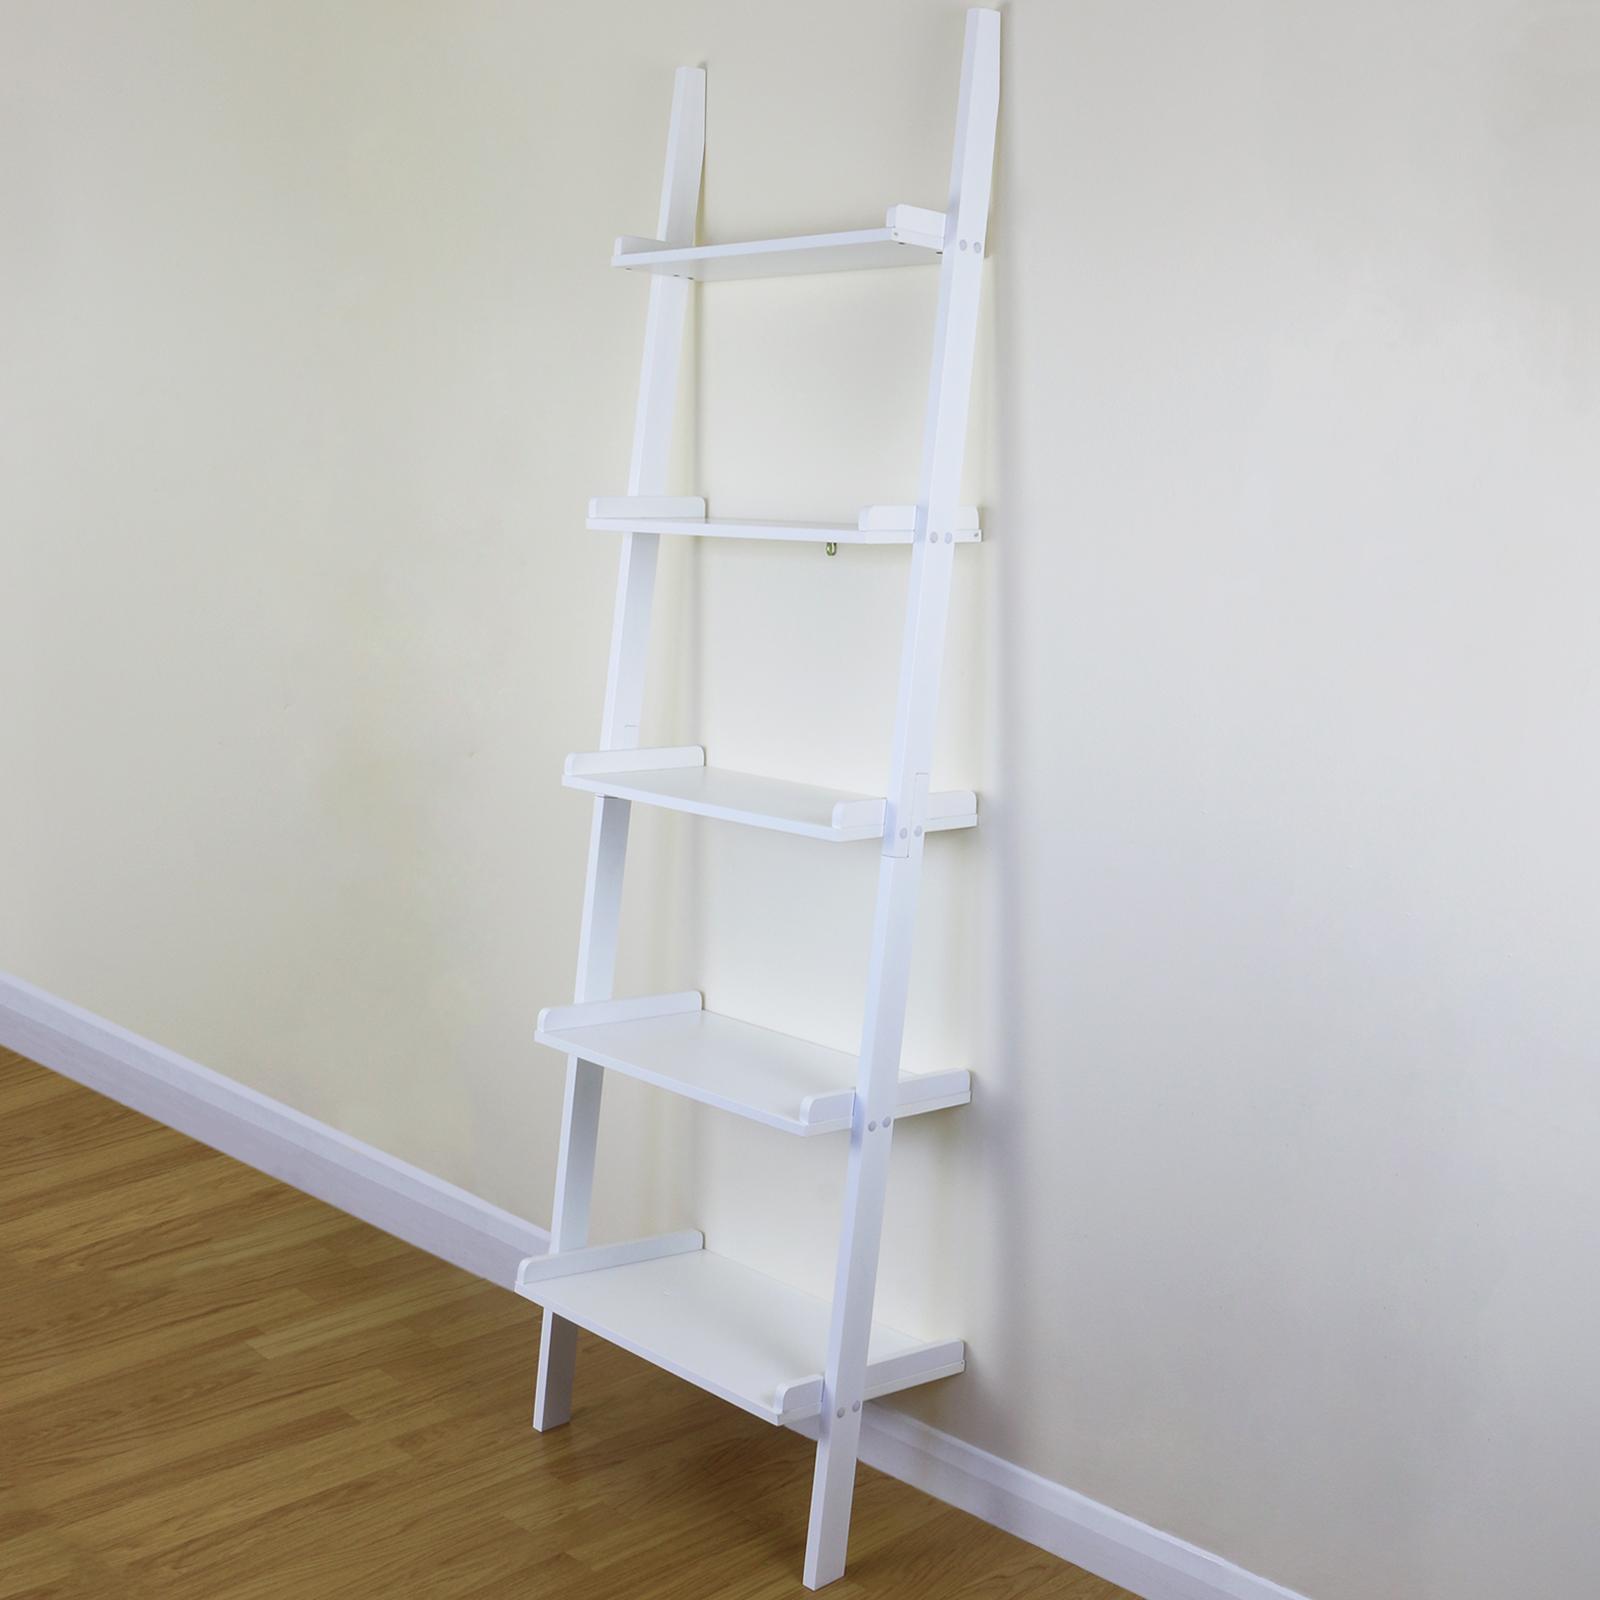 5 Tier White Ladder Wall Shelf Home Storage Display Unit Bookcase Stand Bathroom Ebay